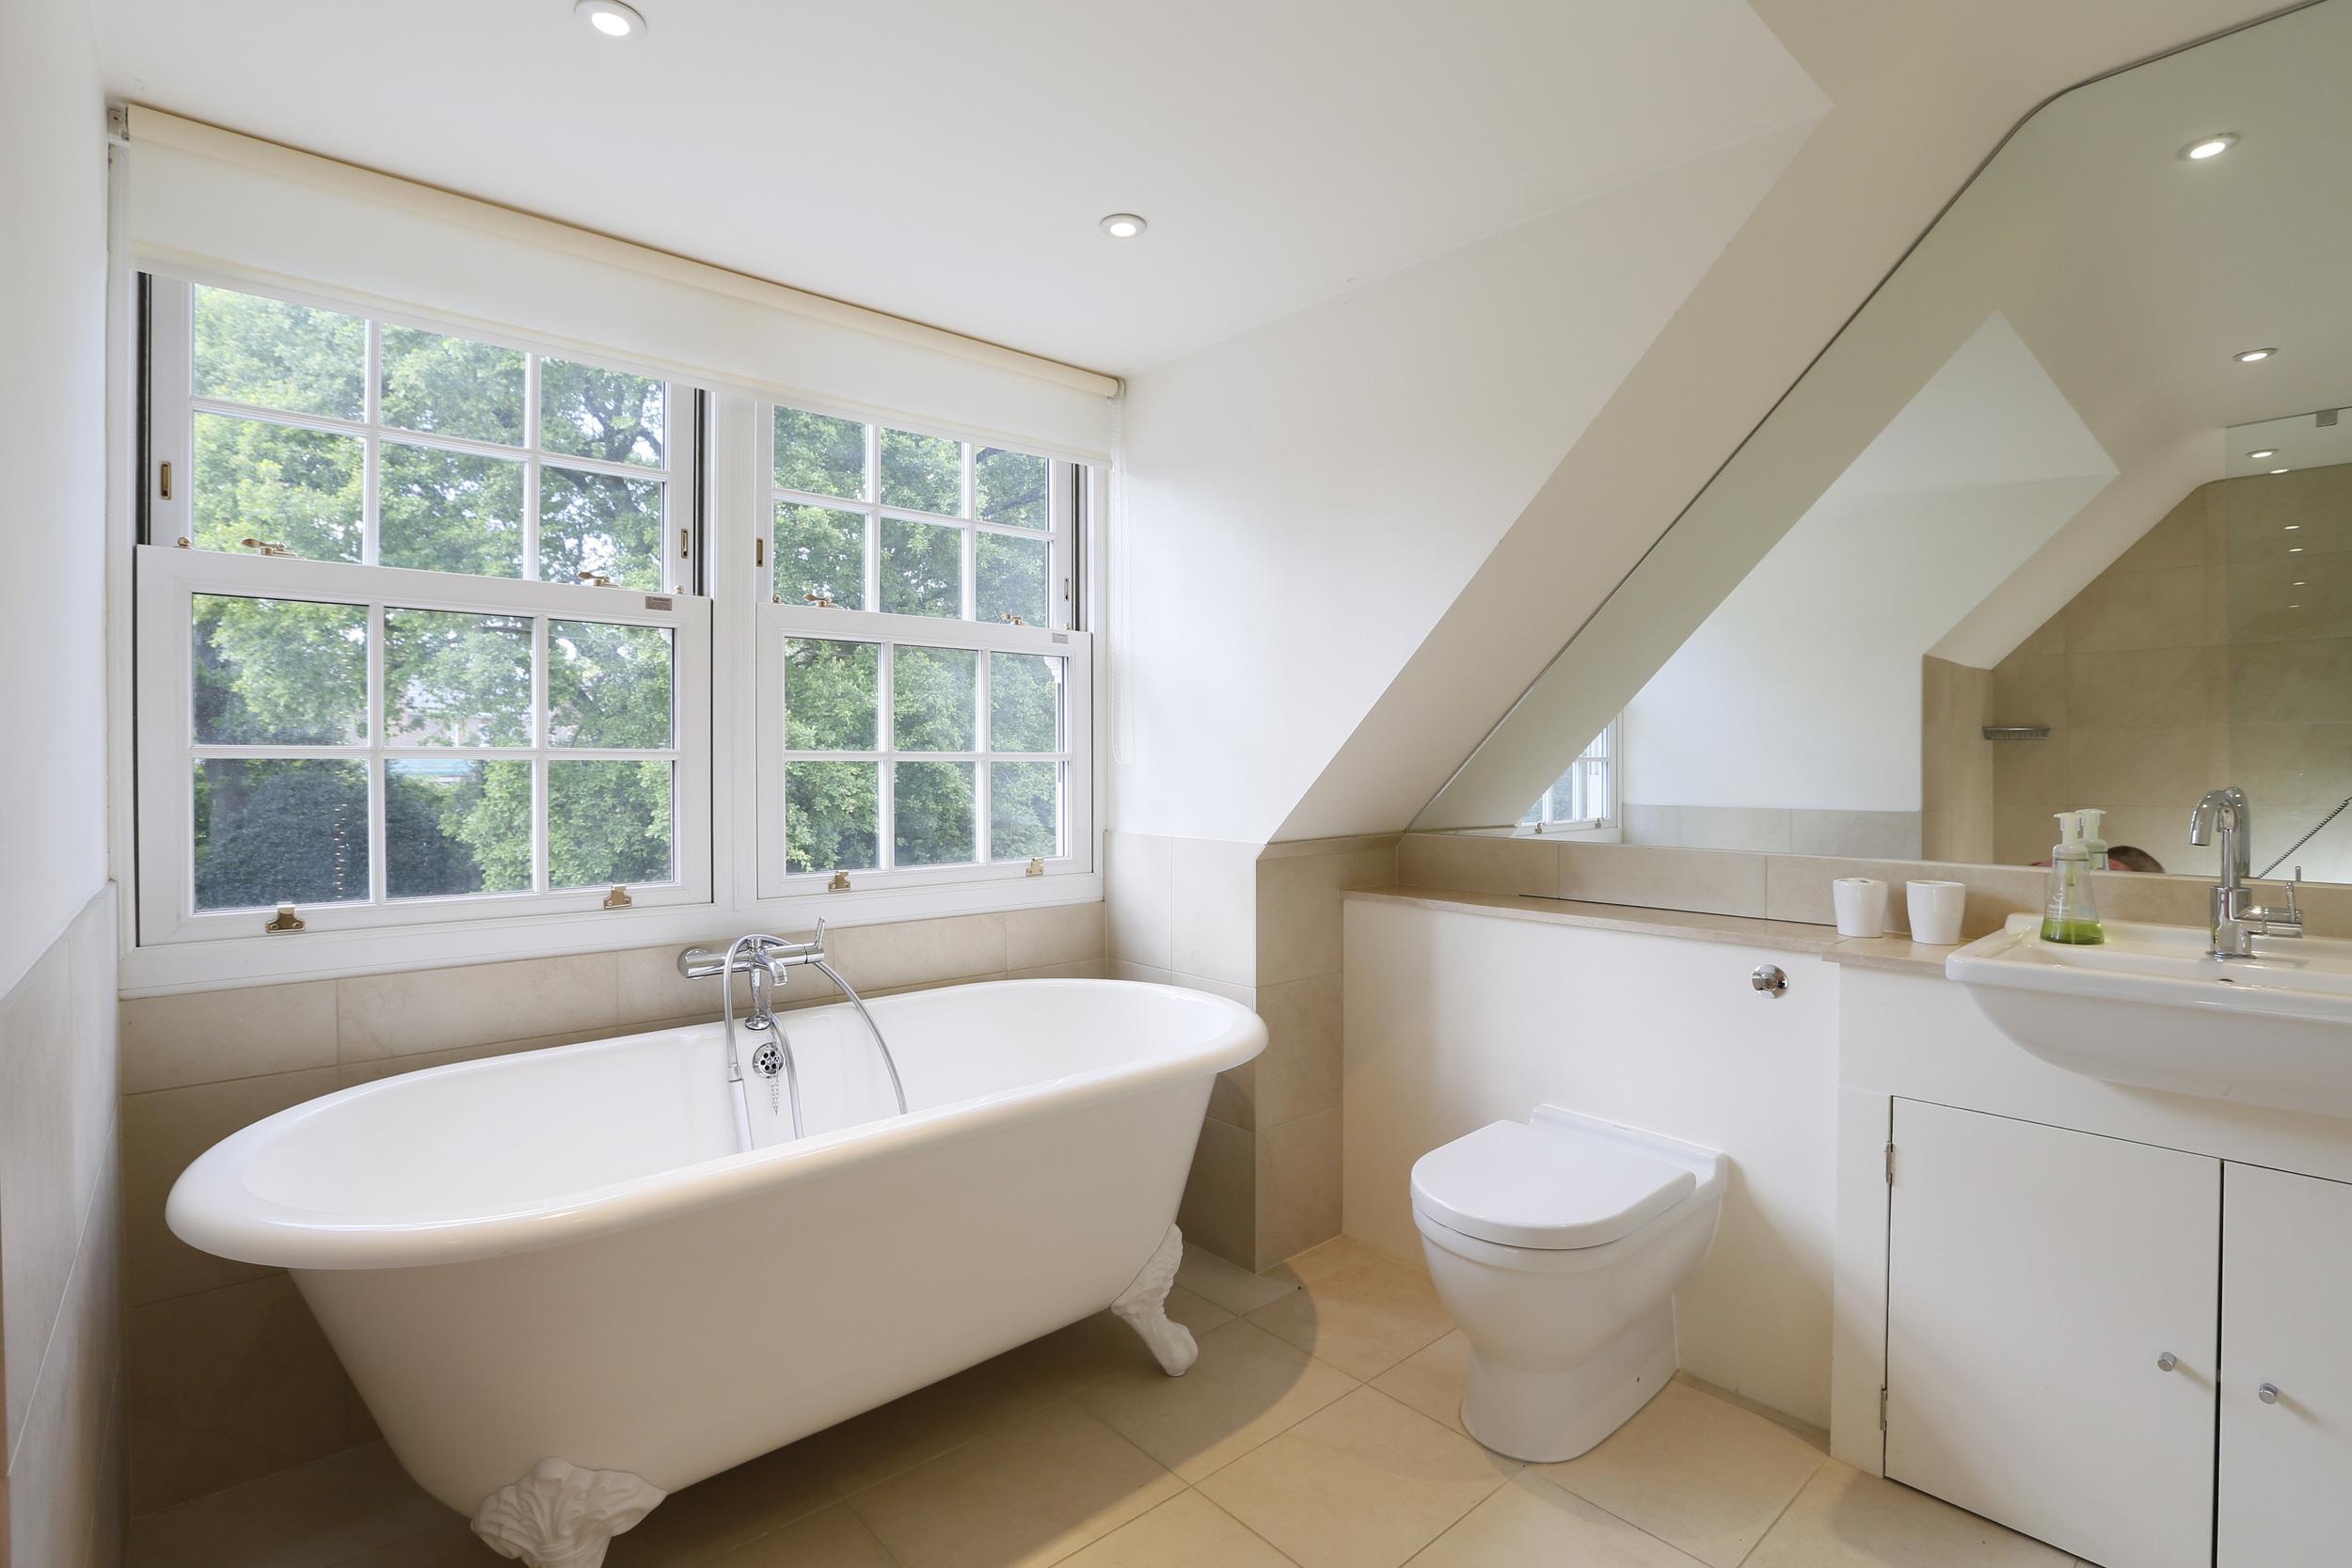 Coombe Lane West 125 - Top Bath.jpg